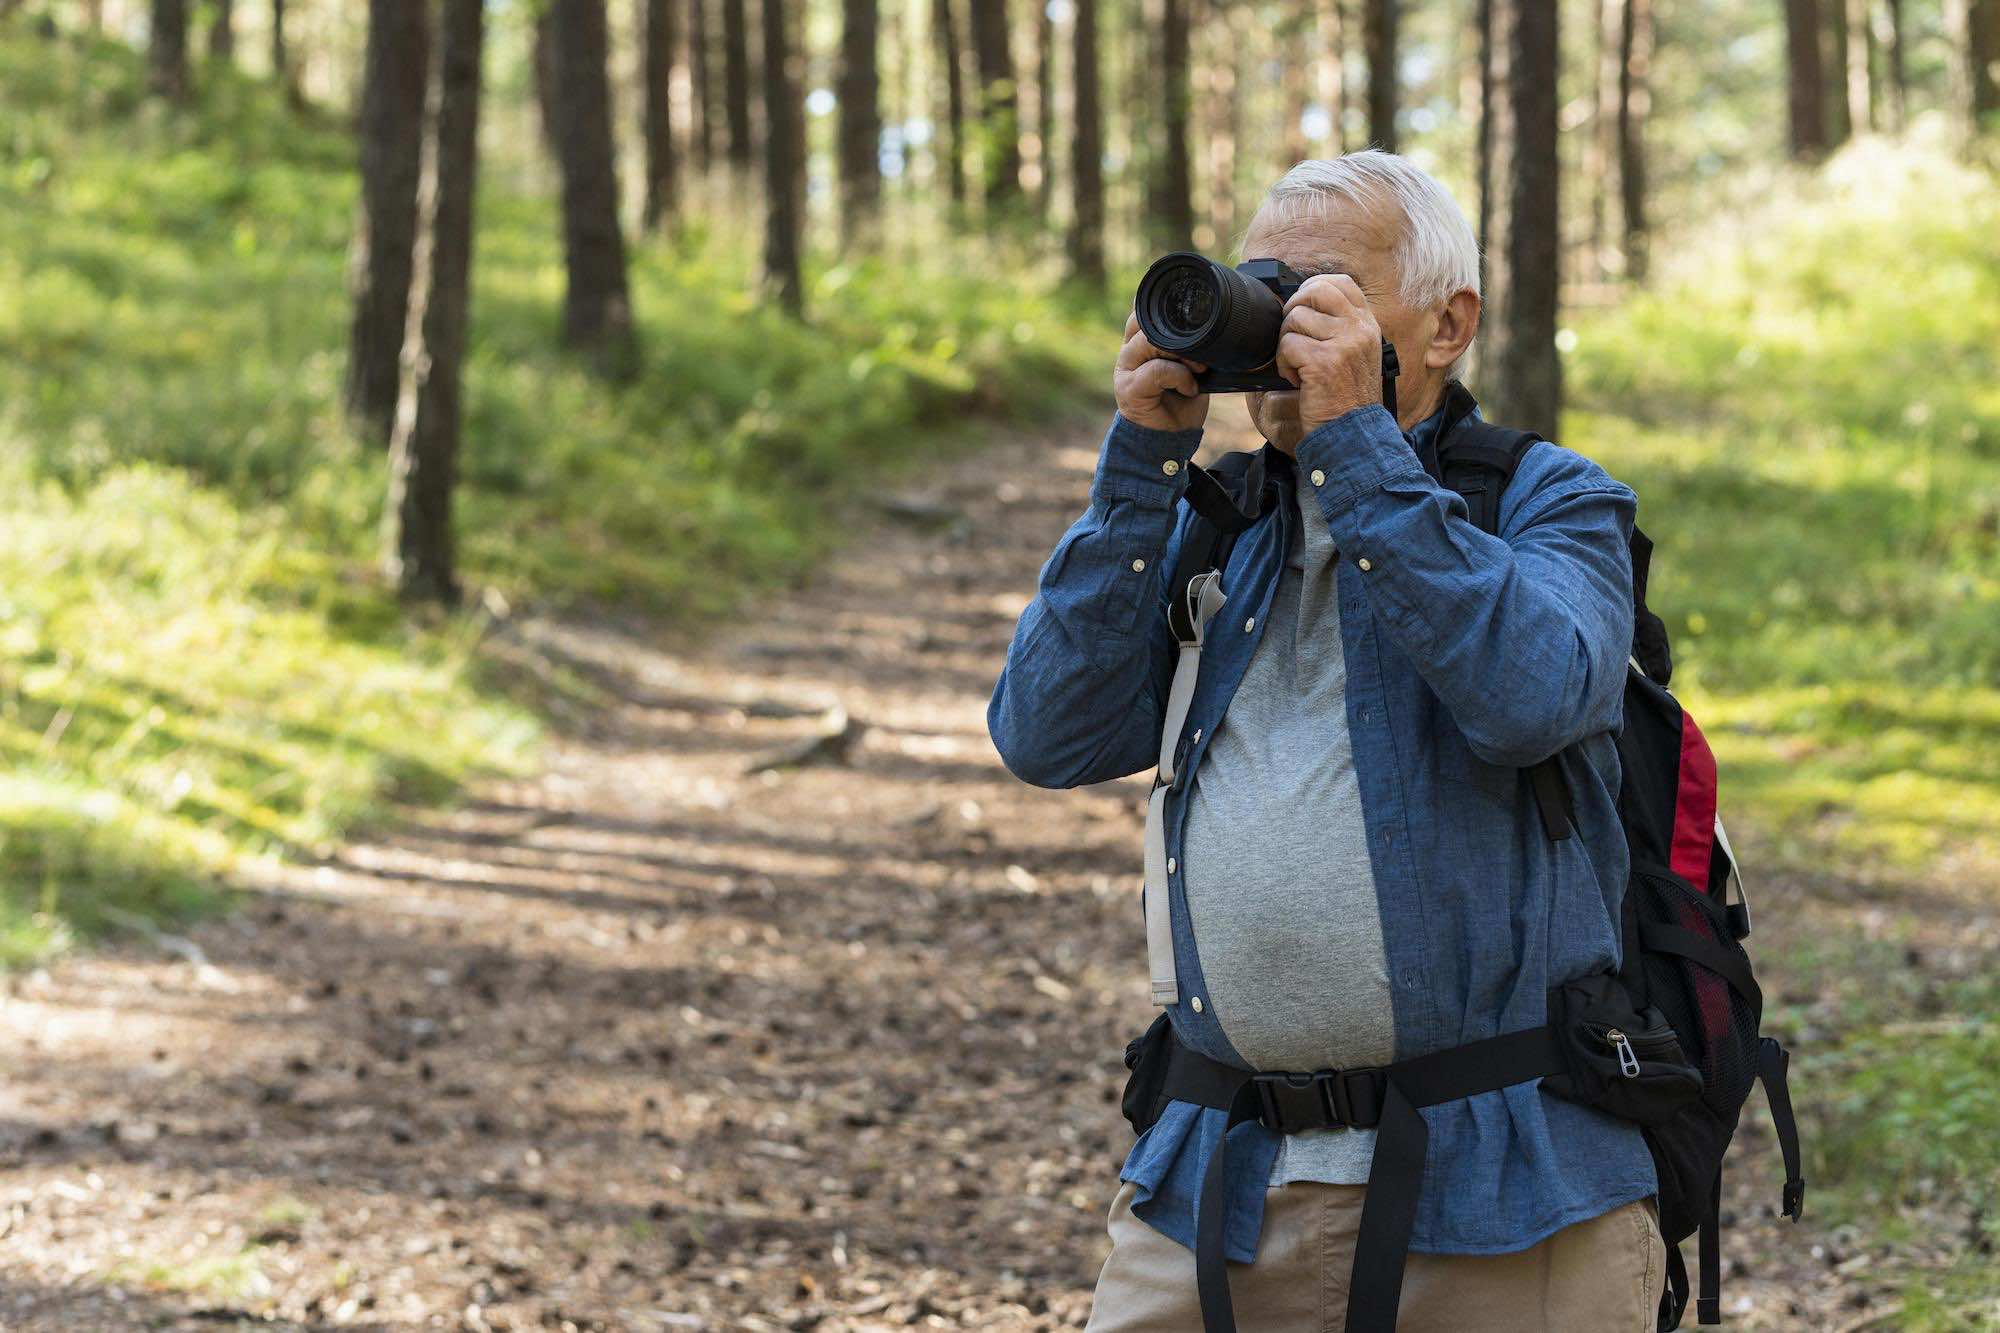 Older man exploring nature with camera